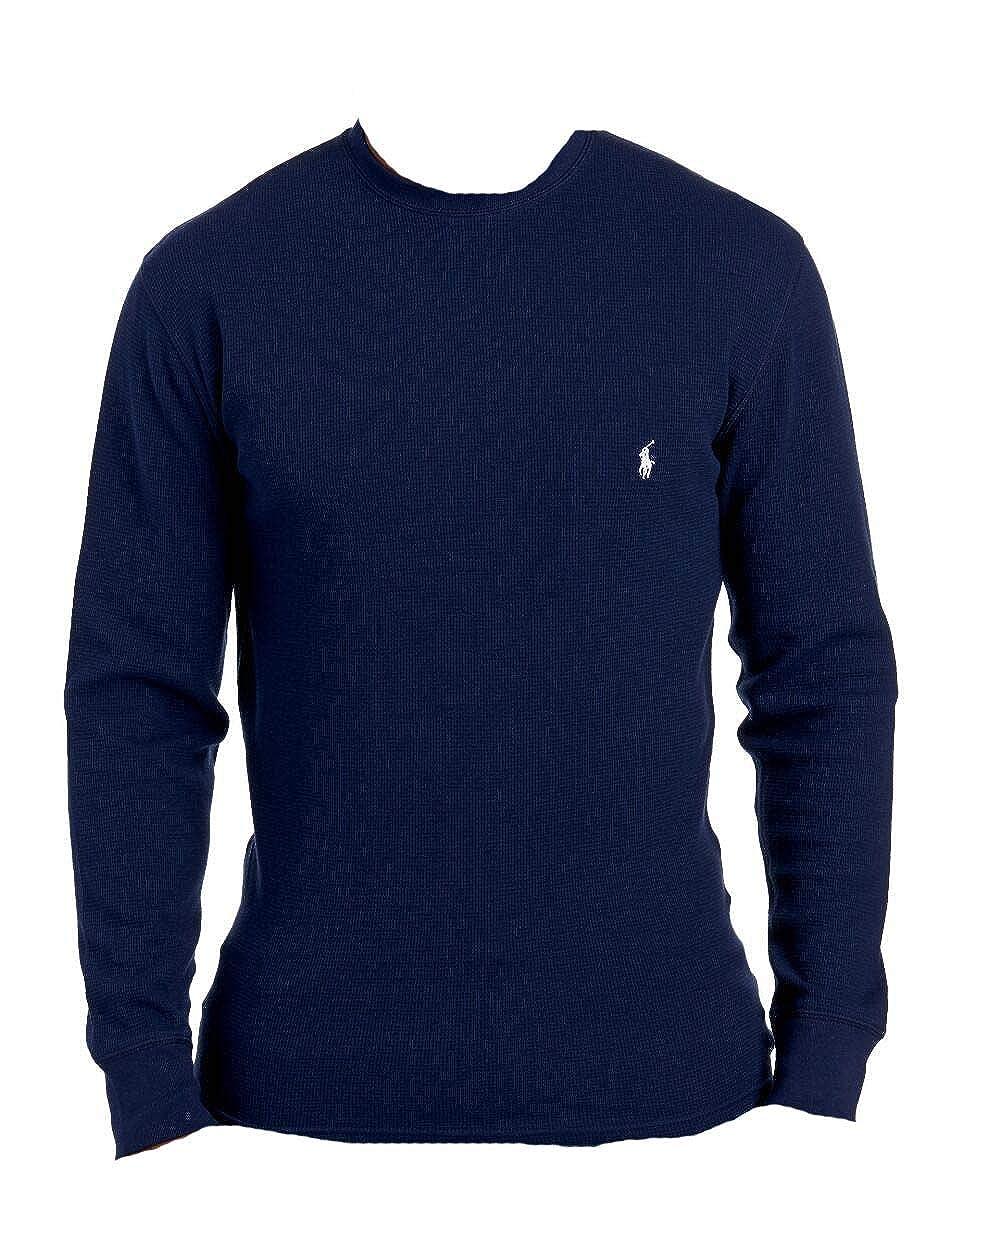 121983b1 Polo Ralph Lauren Men's Long-sleeved T-shirt/Sleepwear / Thermal at Amazon  Men's Clothing store: